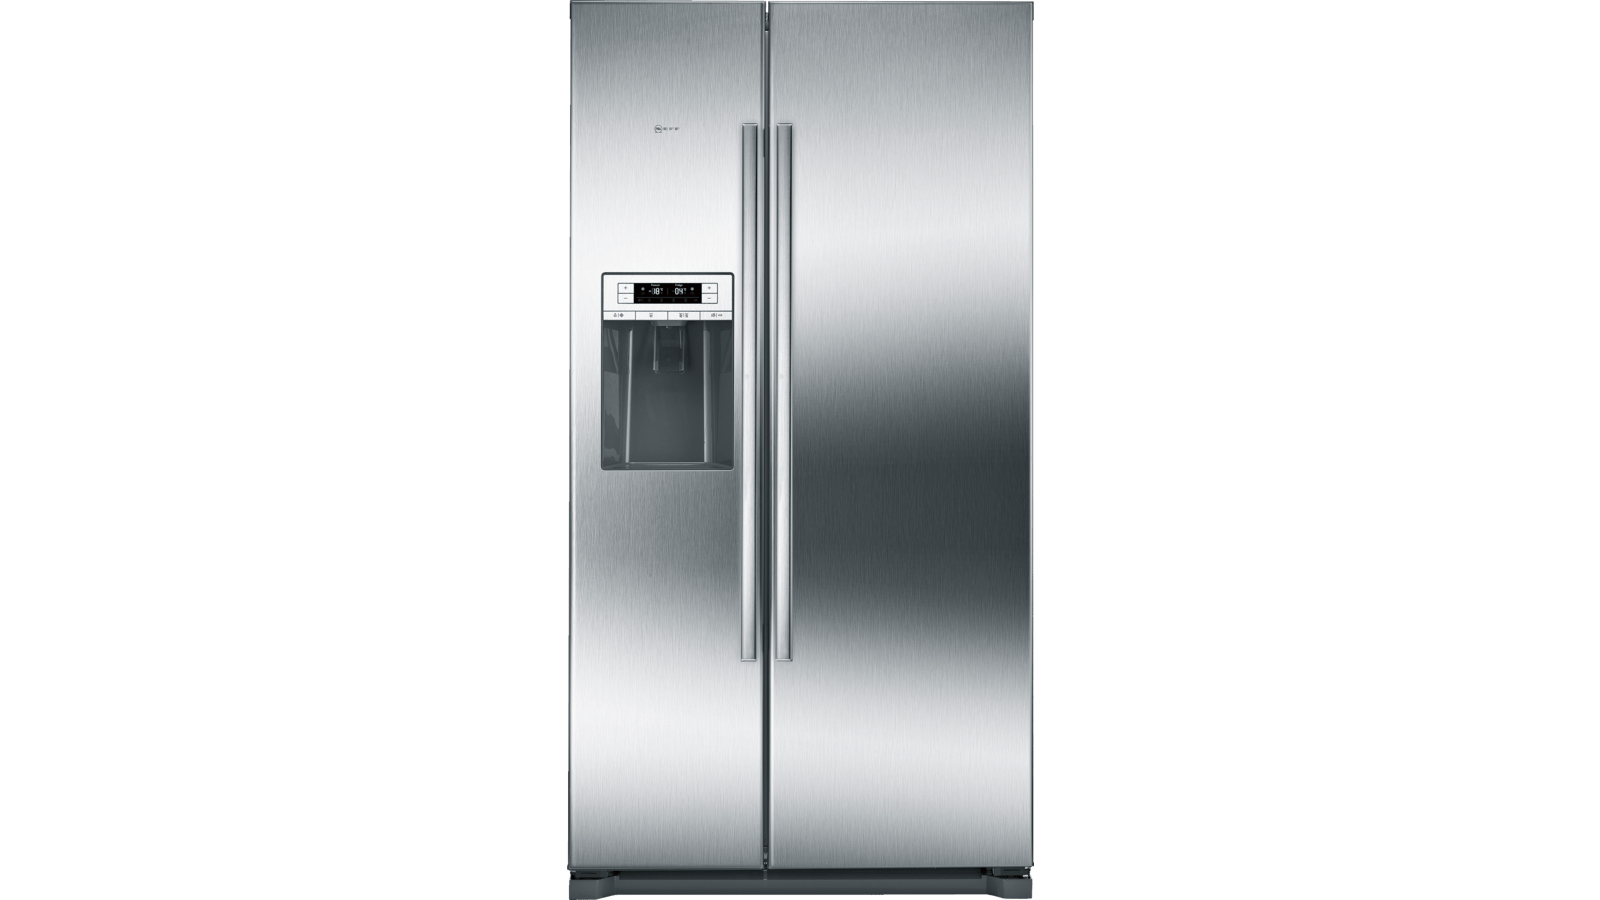 Refrigerateur Americain Faible Largeur n 50 sideside américain 177 x 91 cm inox-easyclean ka3902i20